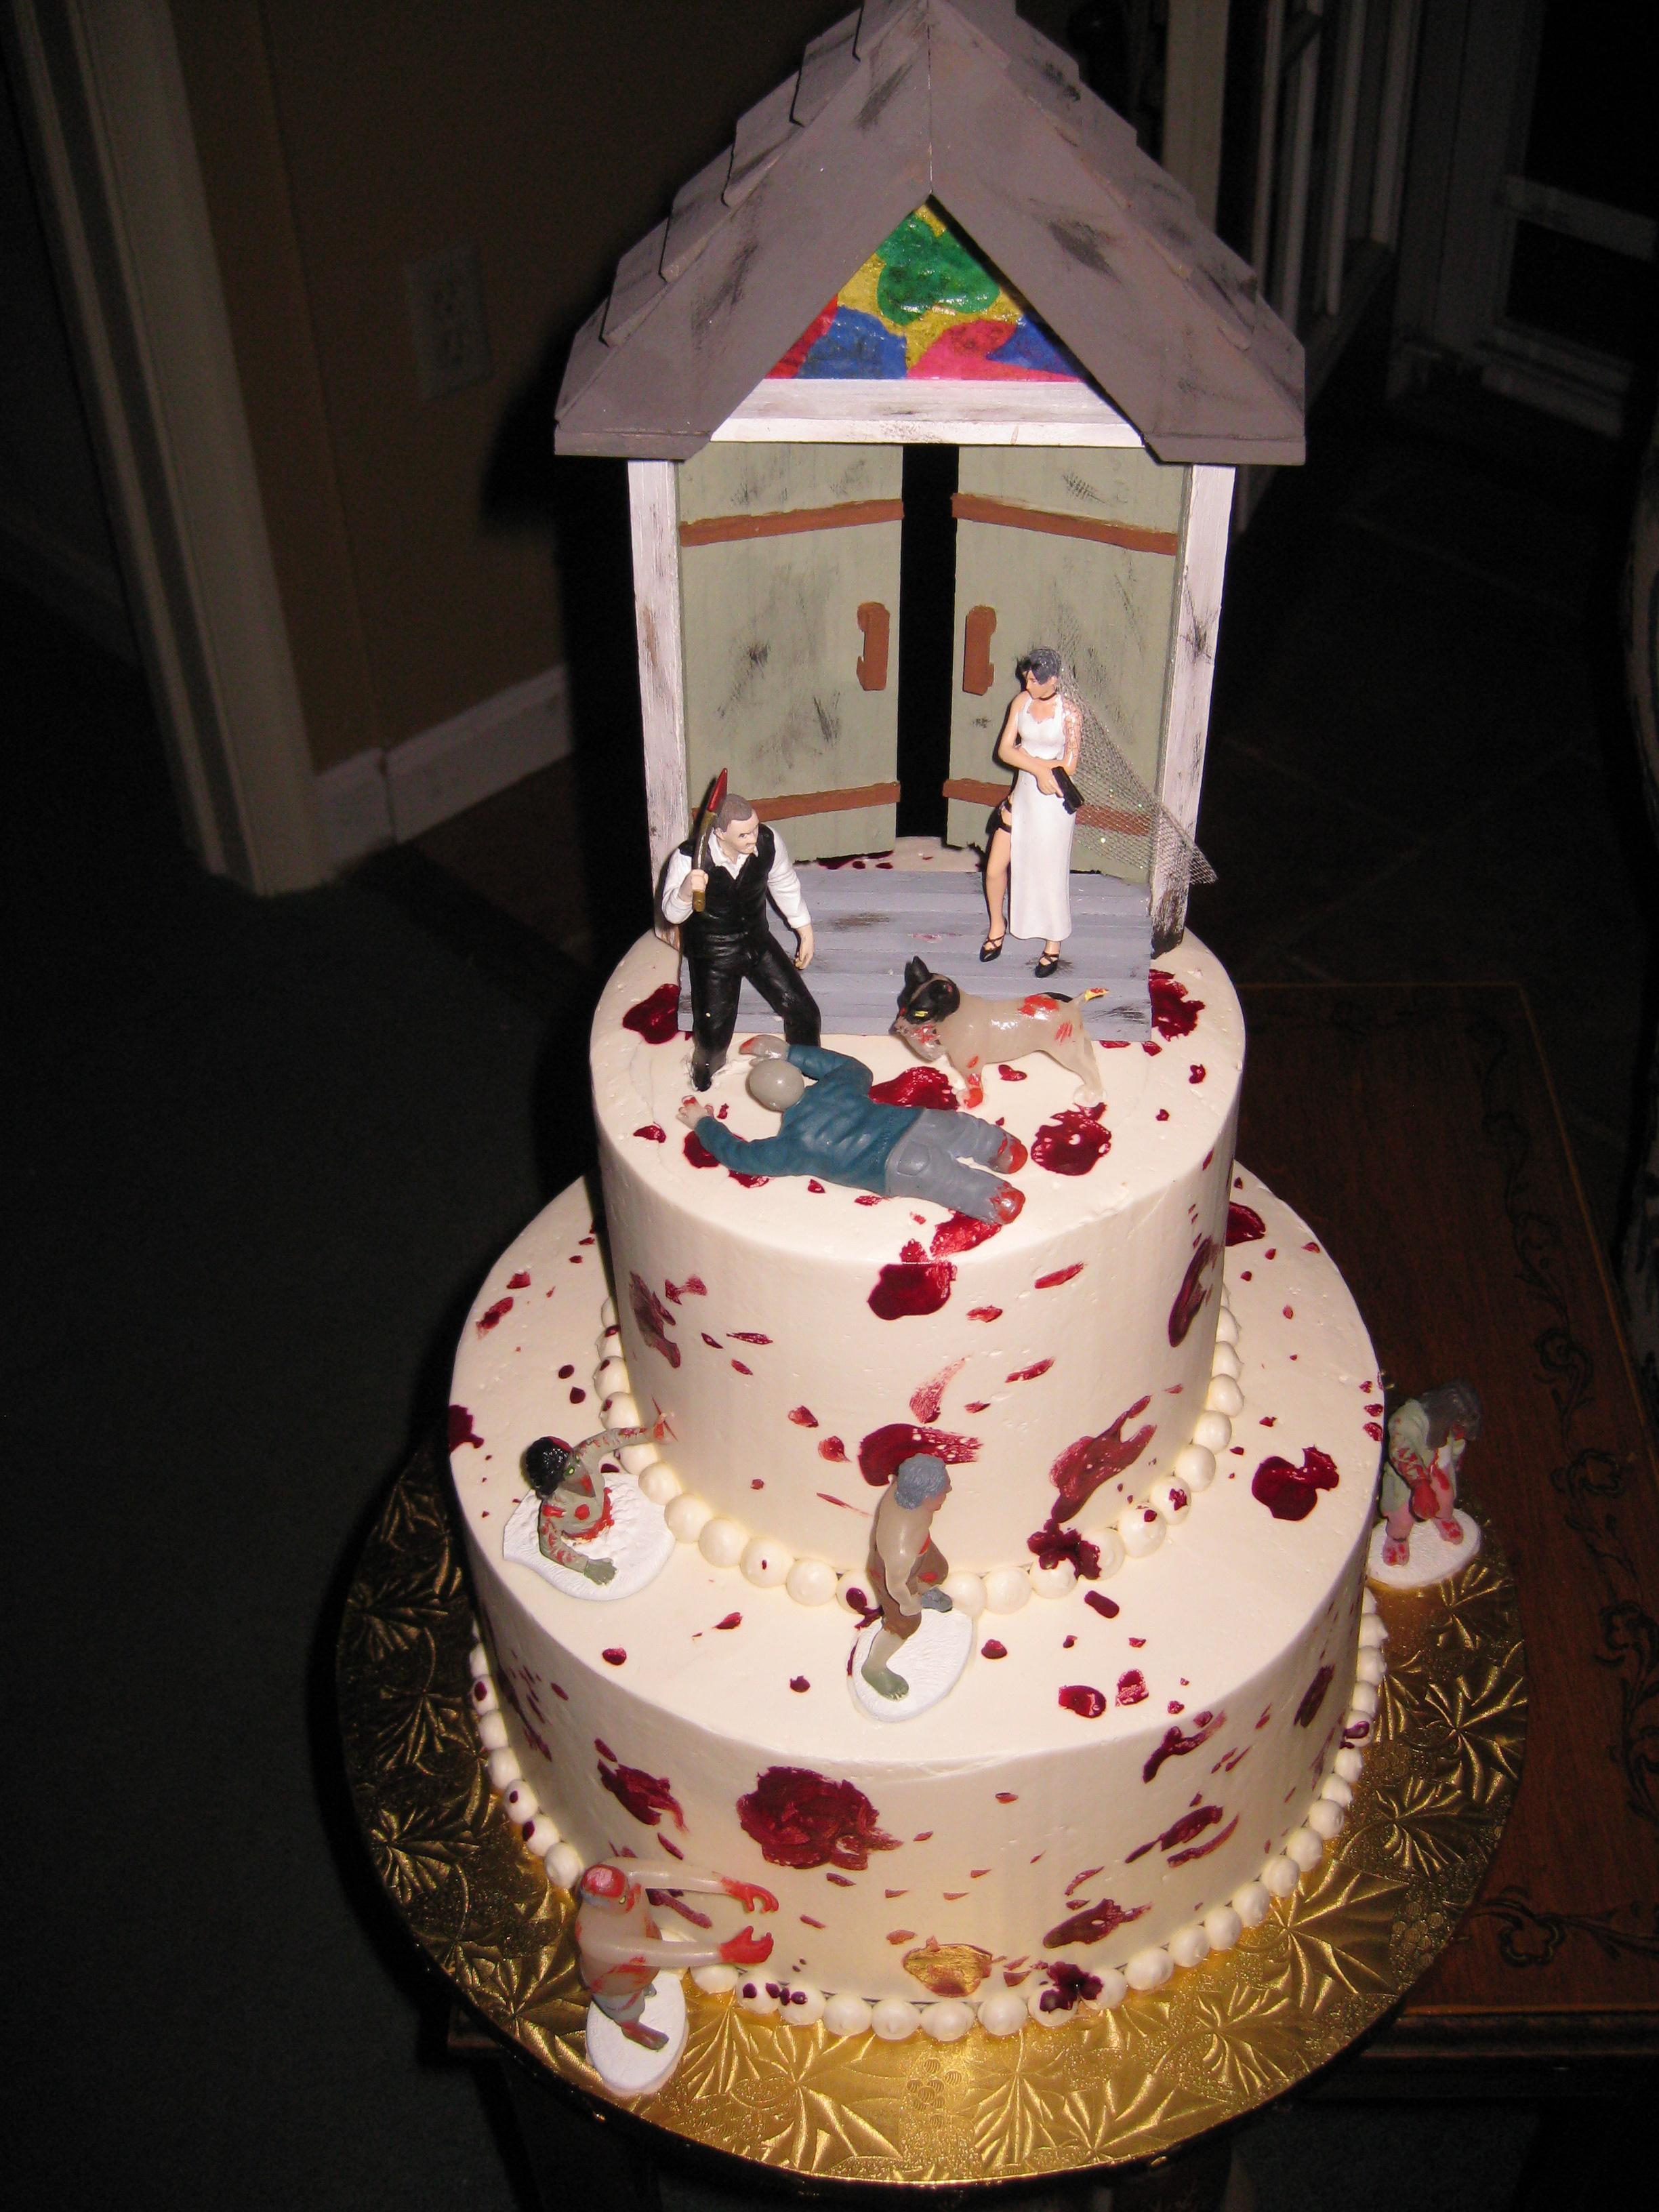 Zombie Wedding Cakes  Awesome Wedding Cakes – NothingsNormal